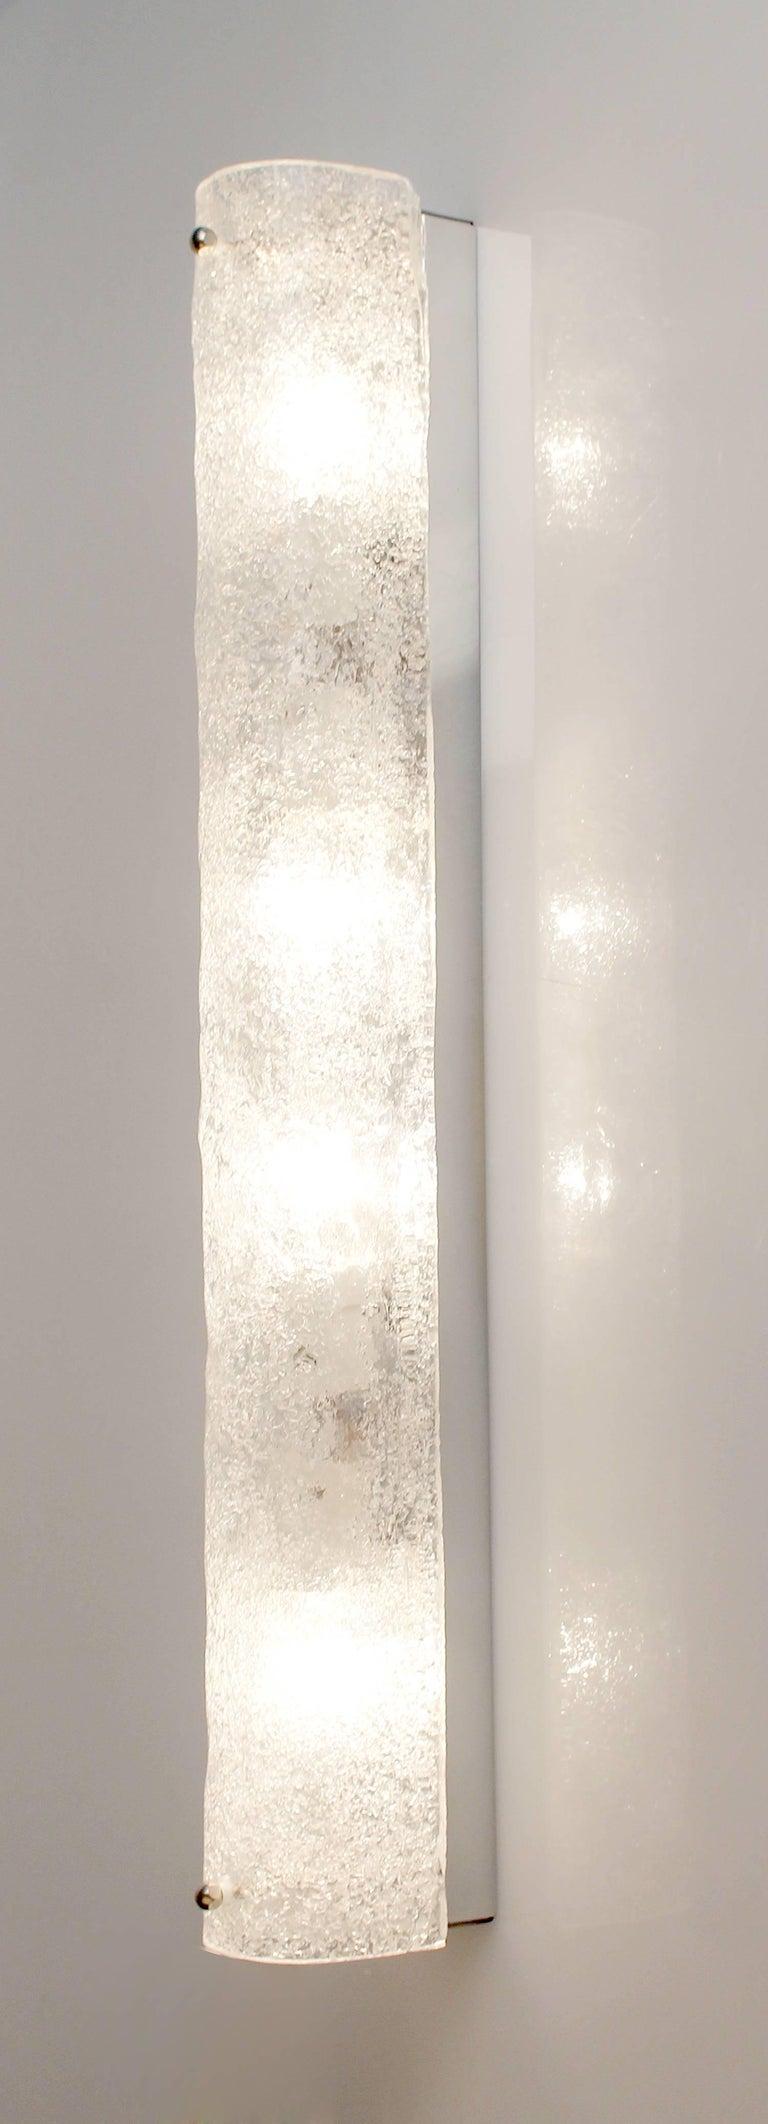 Three Large MidCentury Murano Glass Mirror Vanity Sconces, Gio Ponti Era In Good Condition For Sale In Bremen, DE